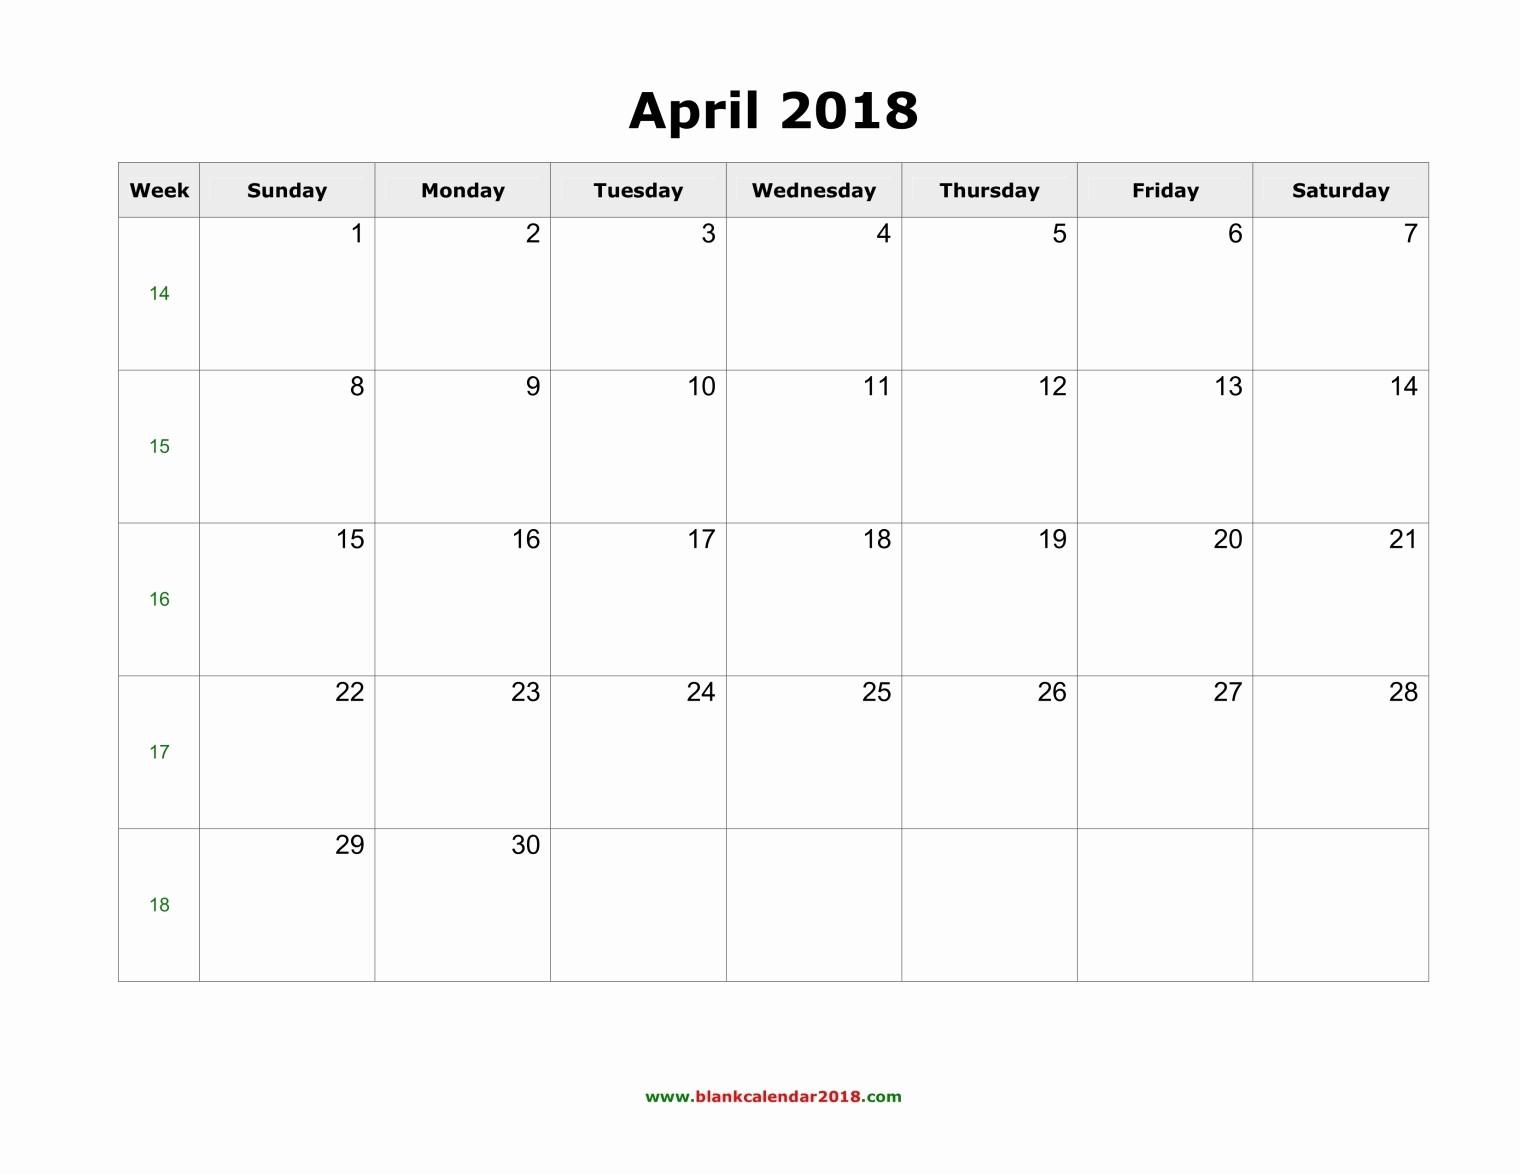 Blank April 2018 Calendar Template Awesome Blank Calendar for April 2018